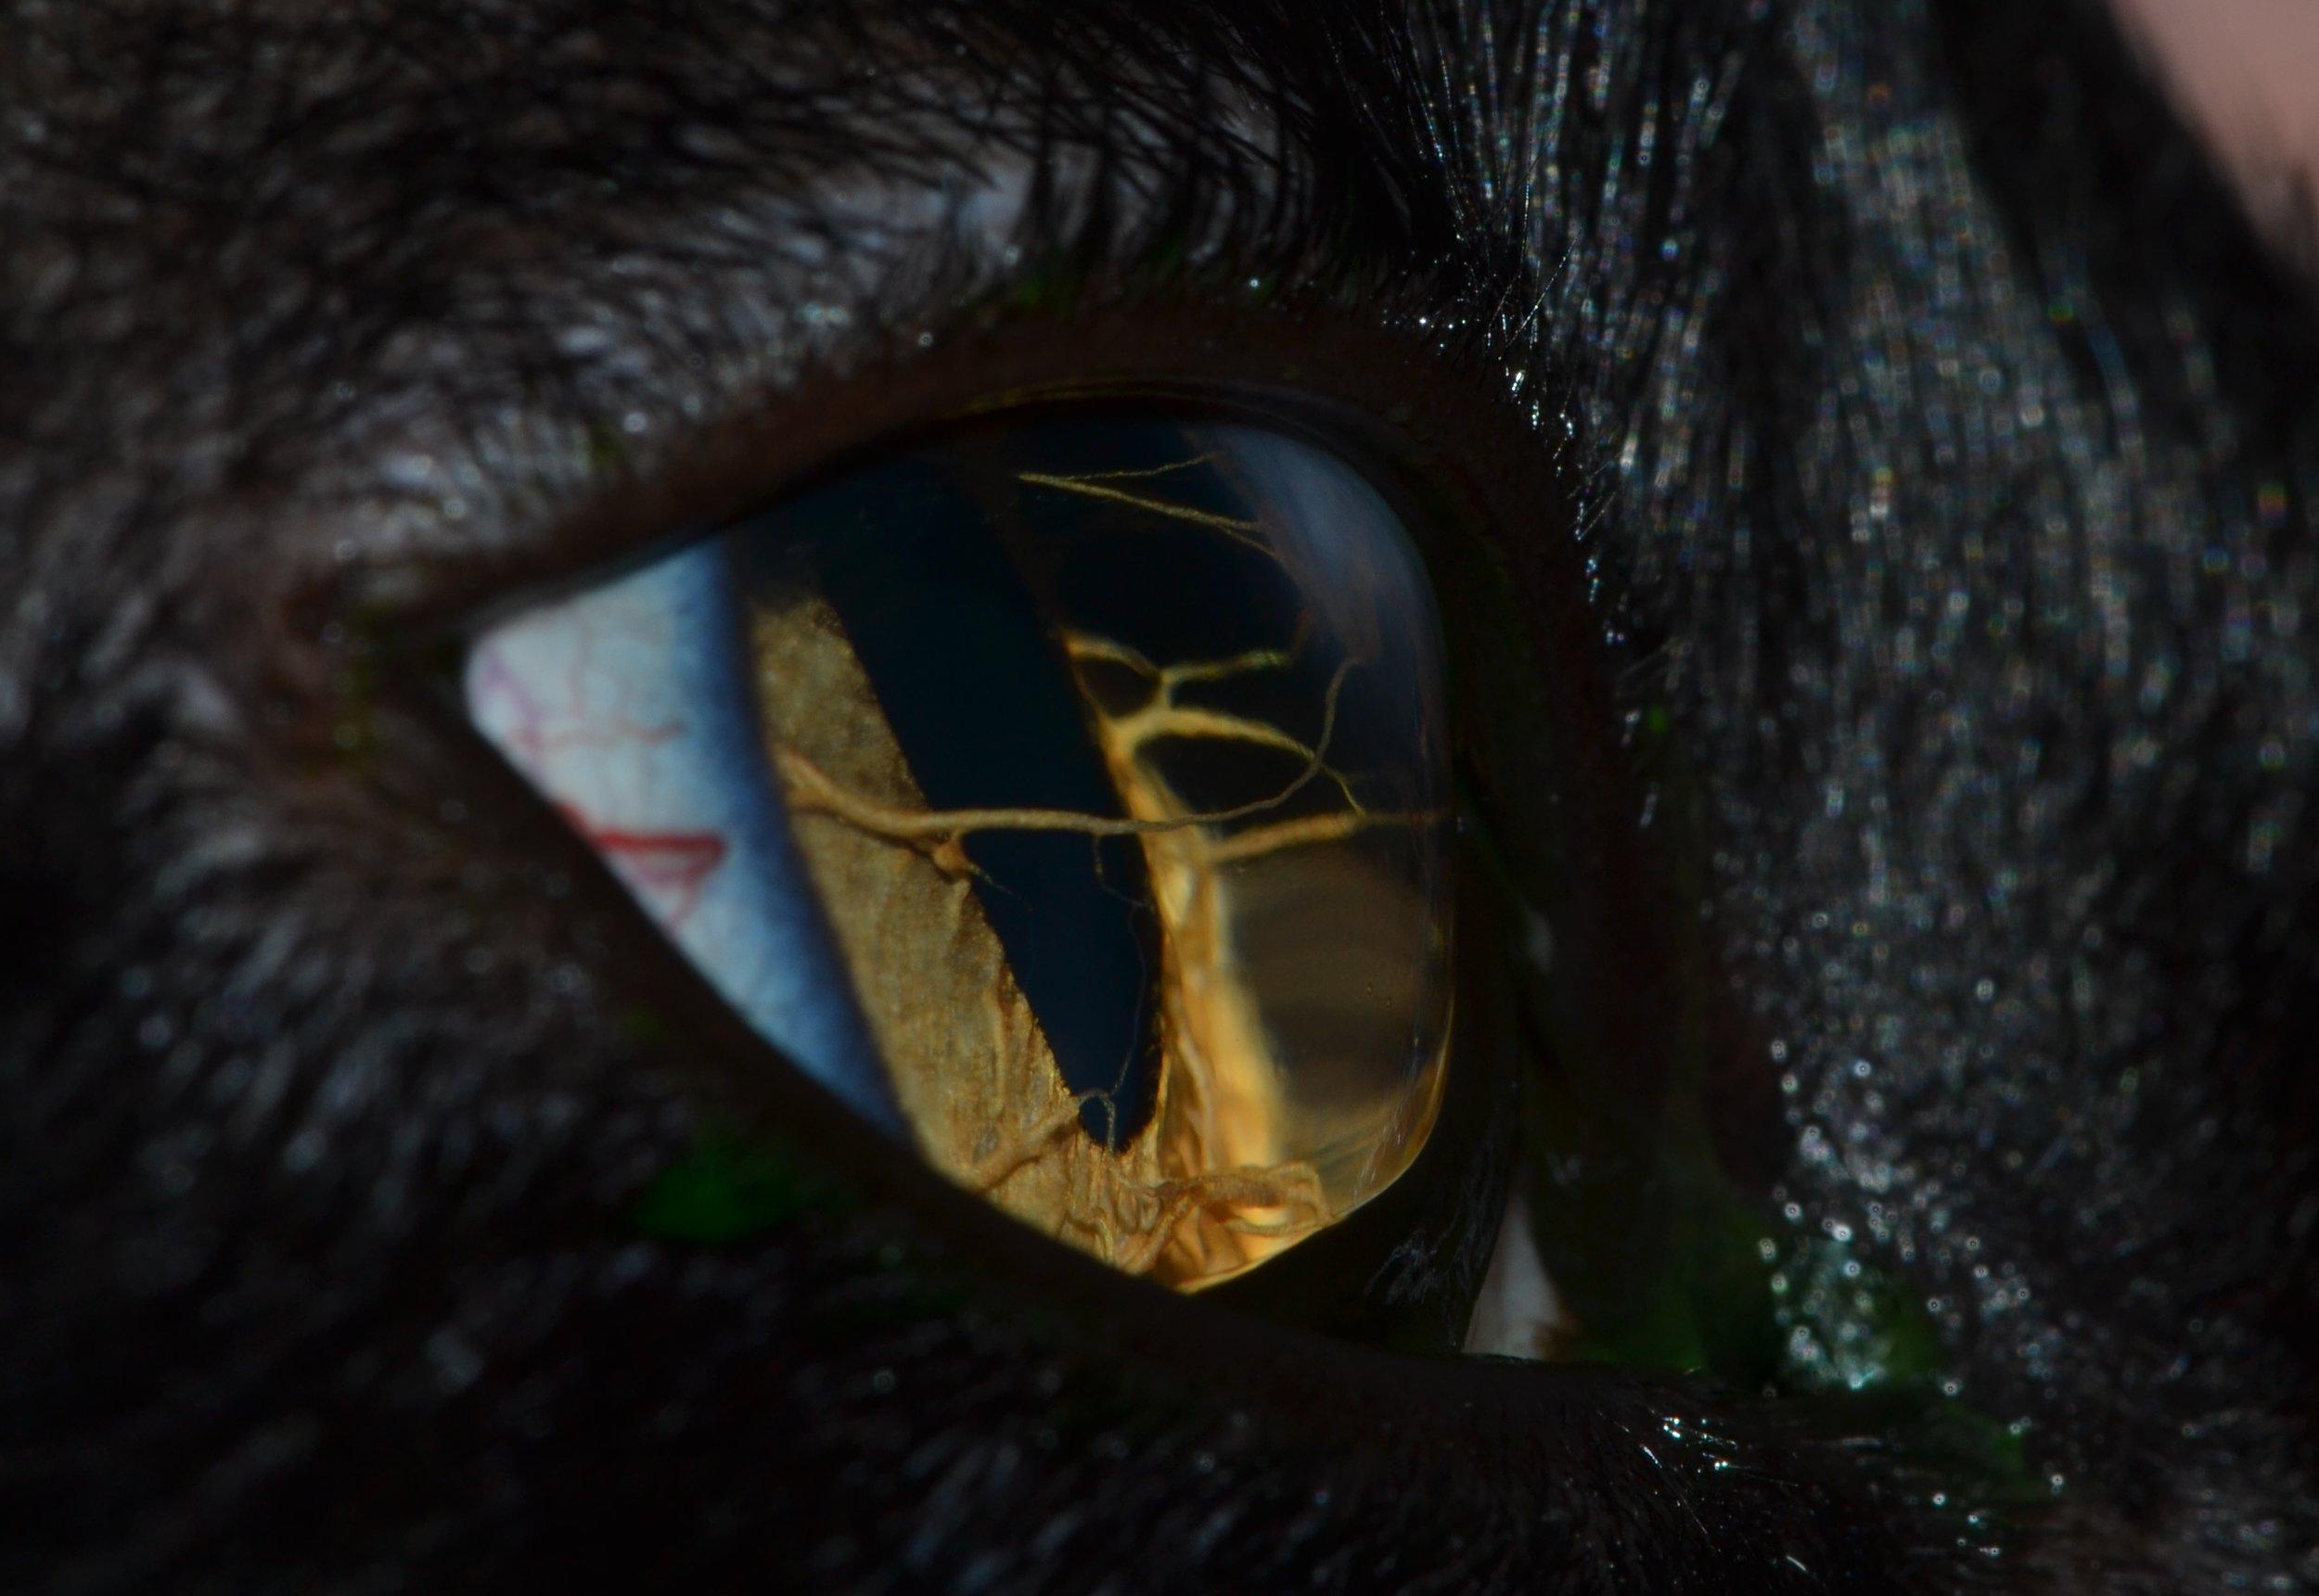 OFA Companion Animal Eye Registry (CAER) Examinations -